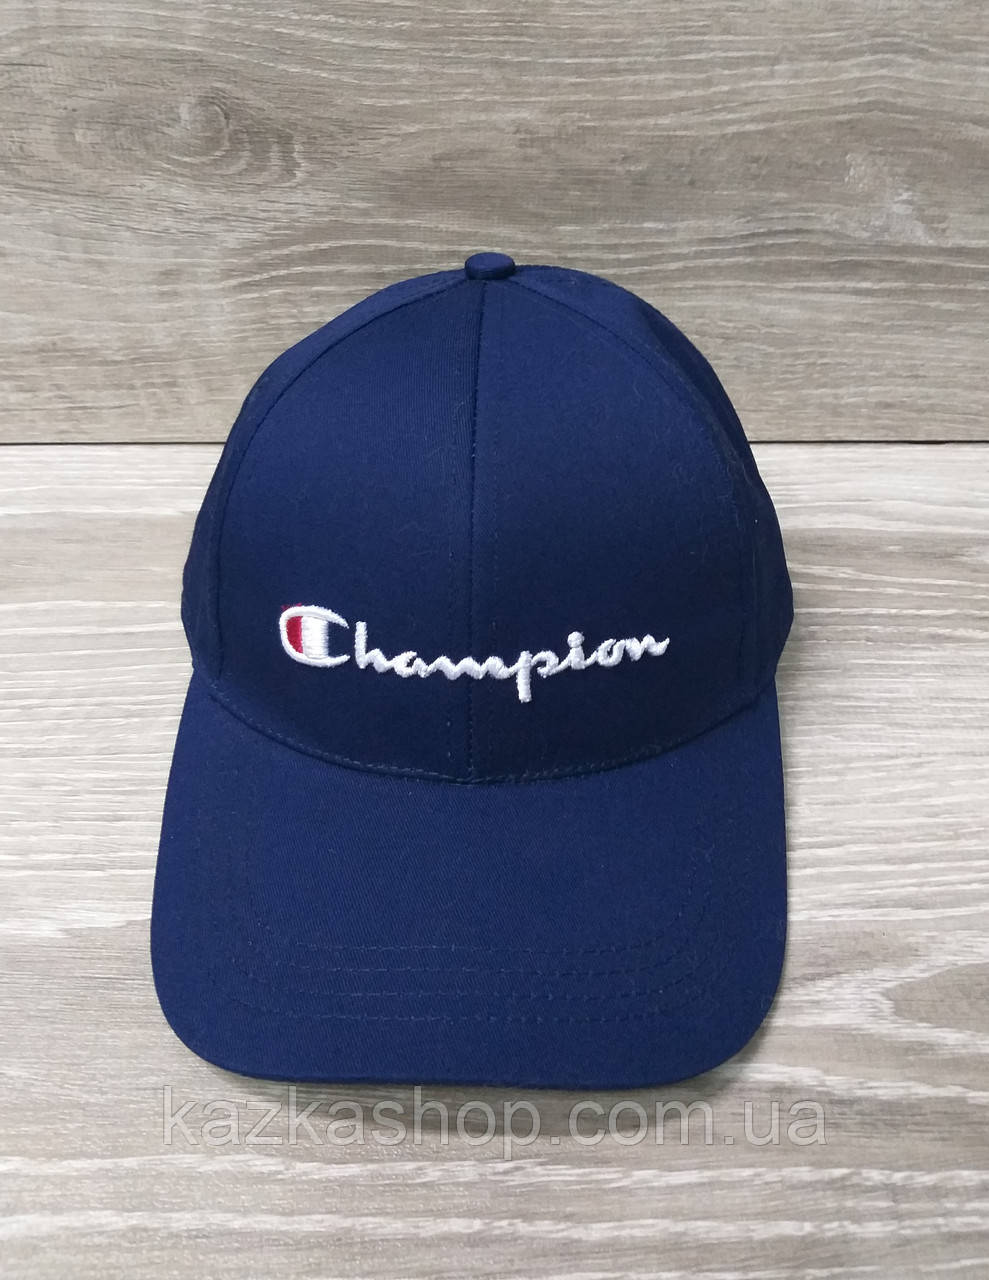 Мужская бейсболка, кепка, материал коттон, вышивка в стиле Champion (реплика), размер 56-58, на регуляторе